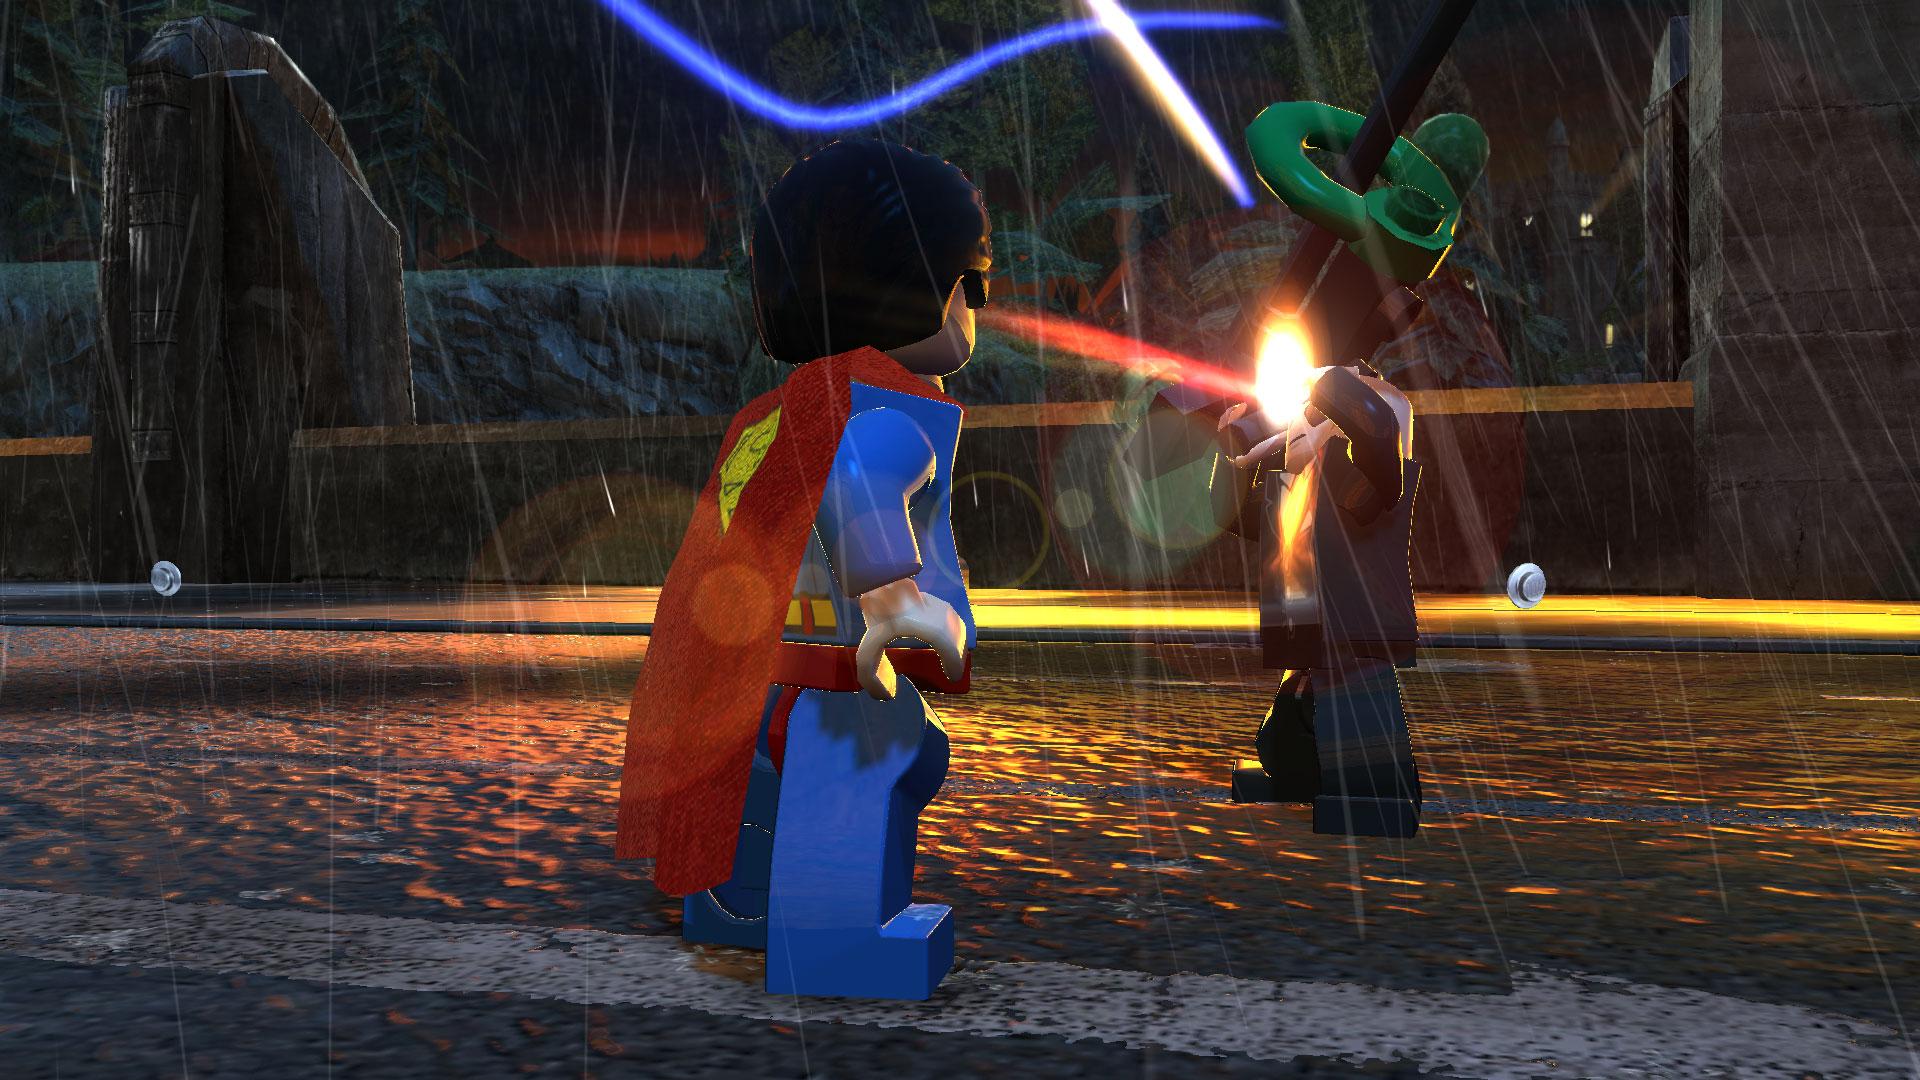 LEGO Batman 2: DC Super Heroes Backgrounds on Wallpapers Vista